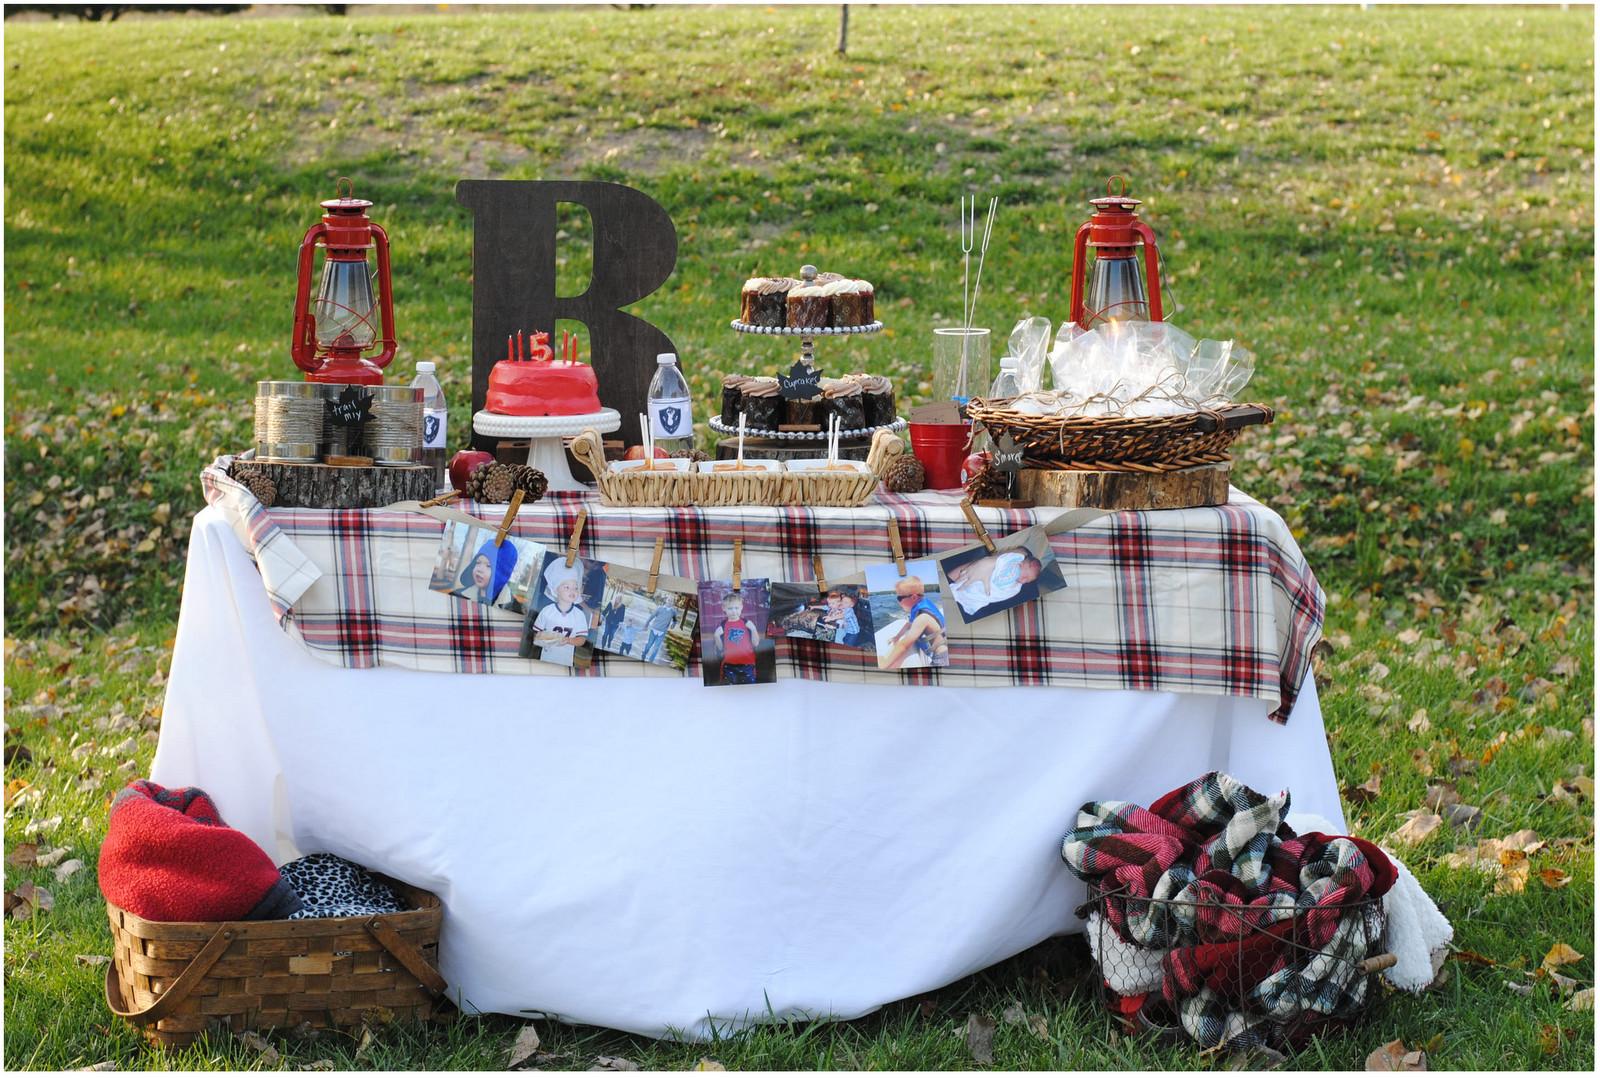 Backyard Bonfire Party Ideas  The Bridal Solution TBS Parties Outdoor Bonfire Birthday